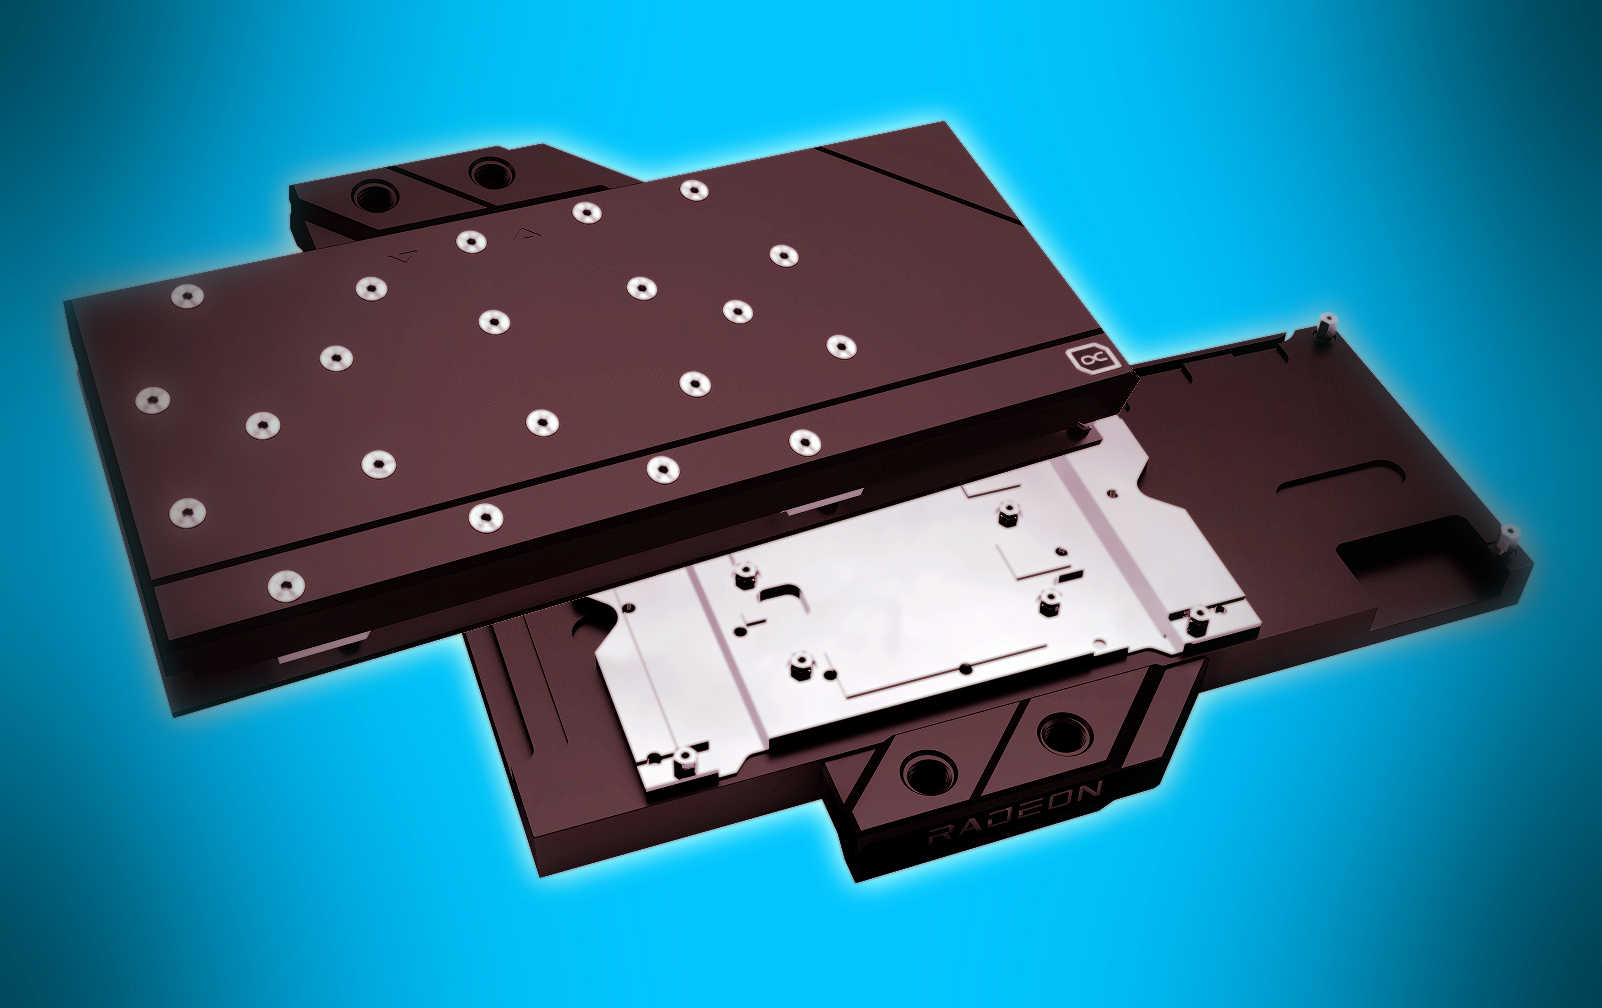 Alphacool announces Eisblock Aurora water block for reference AMD Radeon RX 6900/6800 series – VideoCardz.com